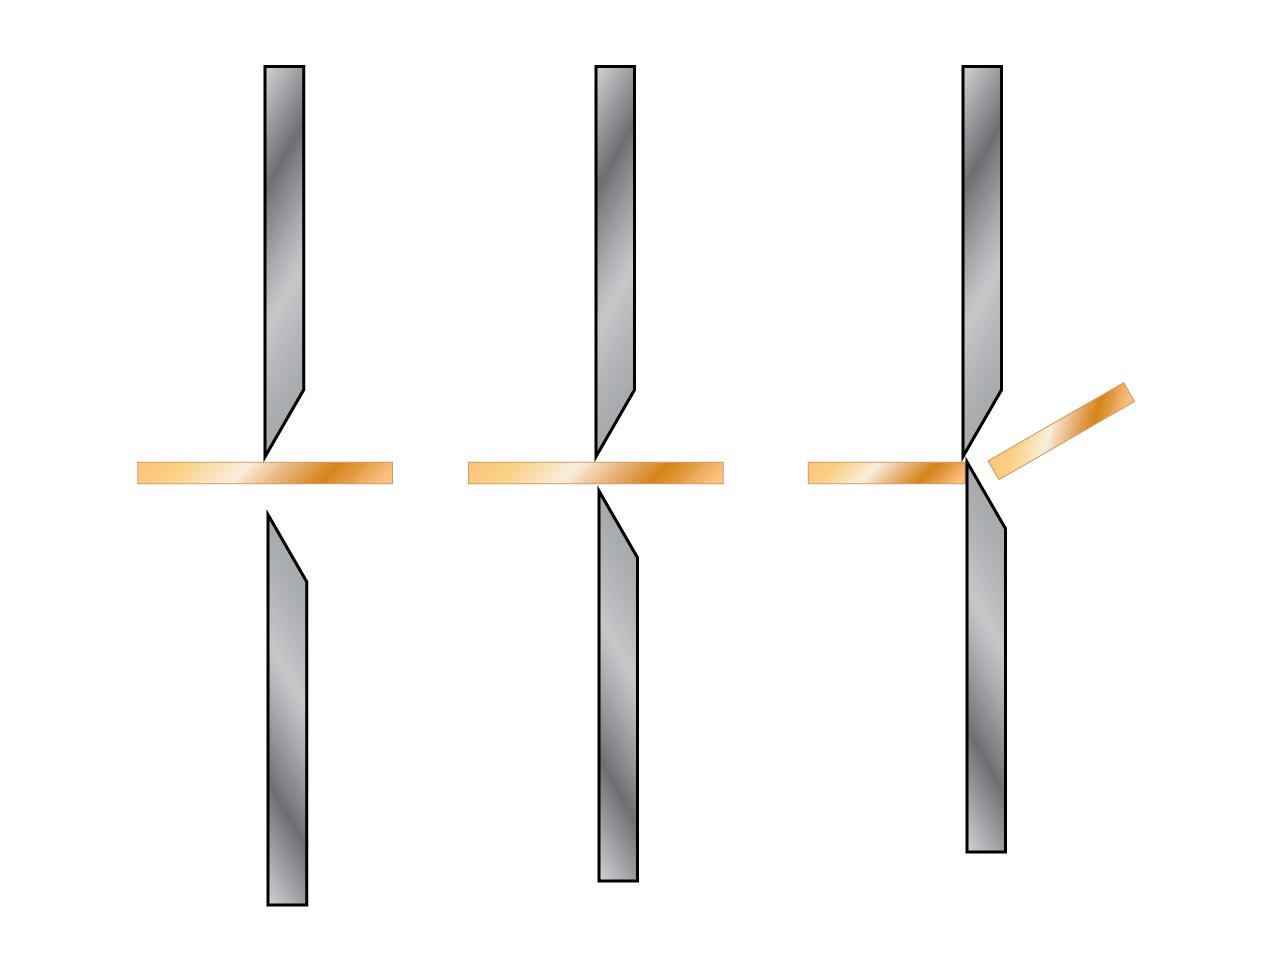 Xuron-Multi-Purpose-Pliers-Cutters-Shears-and-Scissors thumbnail 28